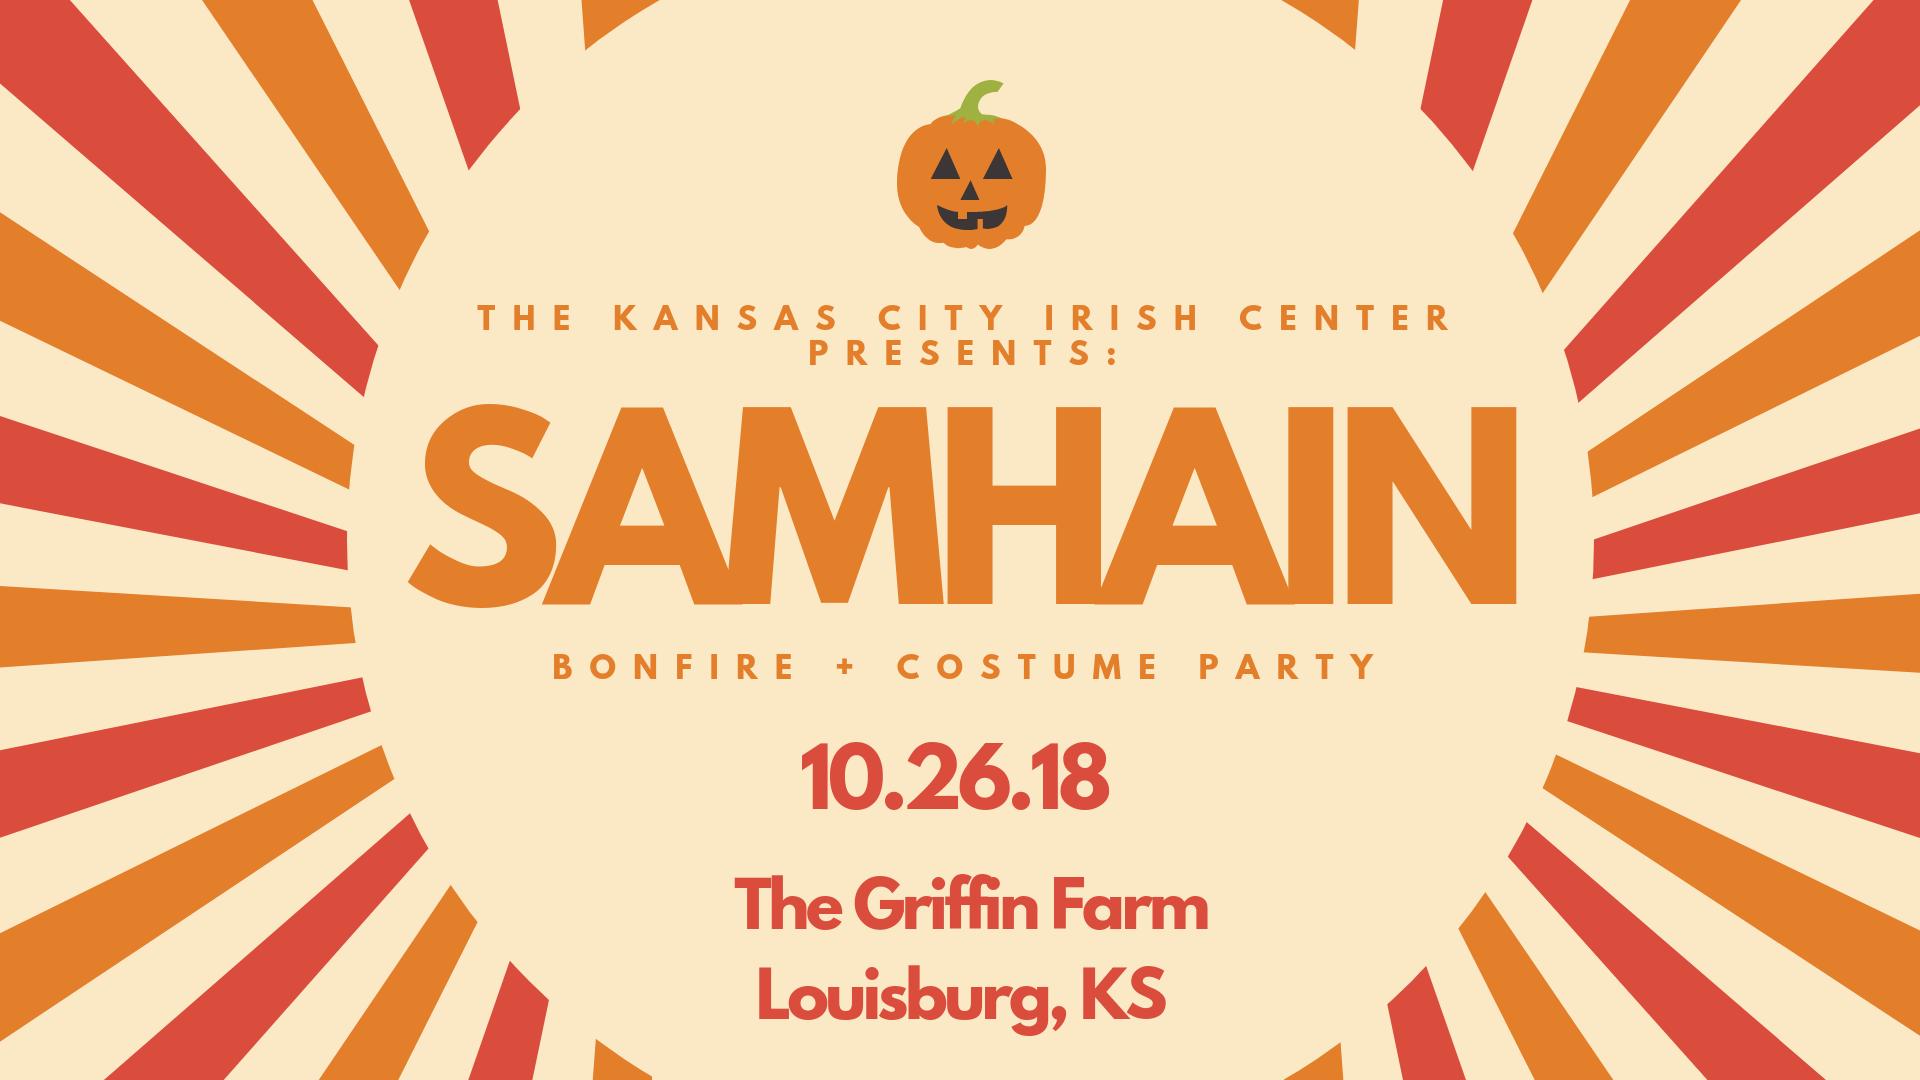 Samhain Bonfire - Oct. 26, 2018